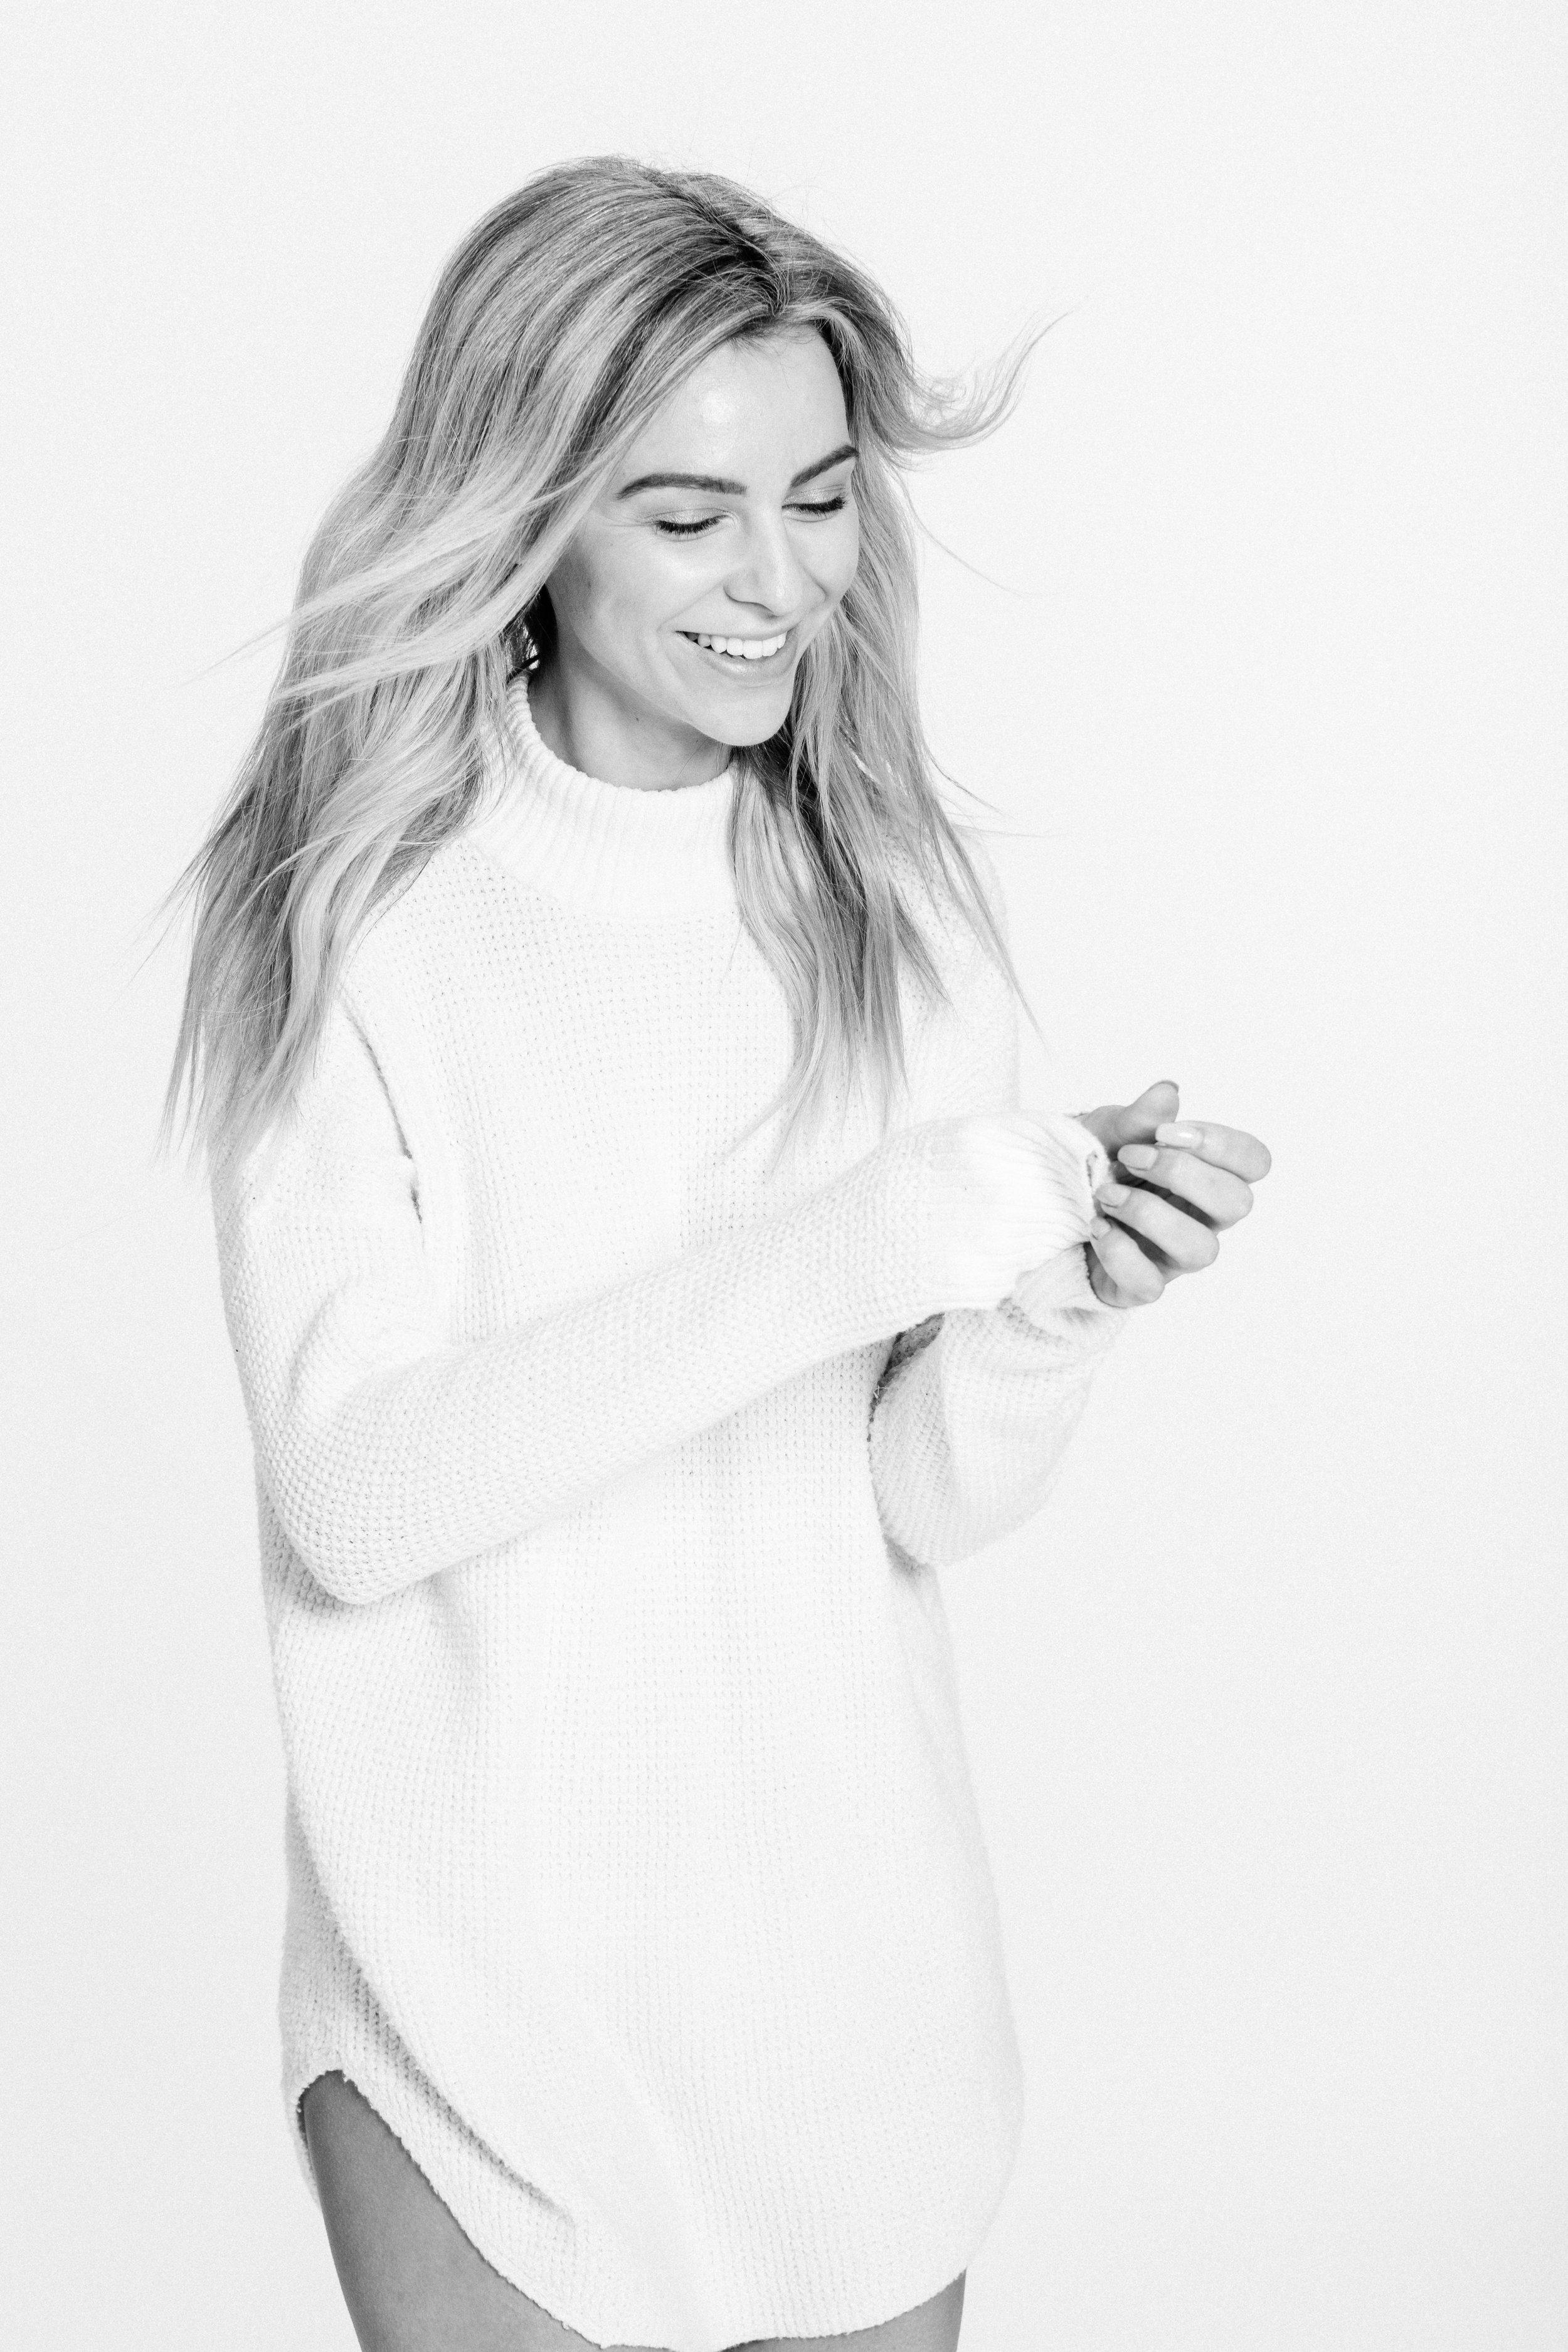 Youtube V-Logger #MelissaMerk photographed by Anick Violette. #Makeup by Katie Elwood using #YSLBEAUTY #NATURALMAKEUP Hair by Jade Kugelman using #KEVINMURPHY